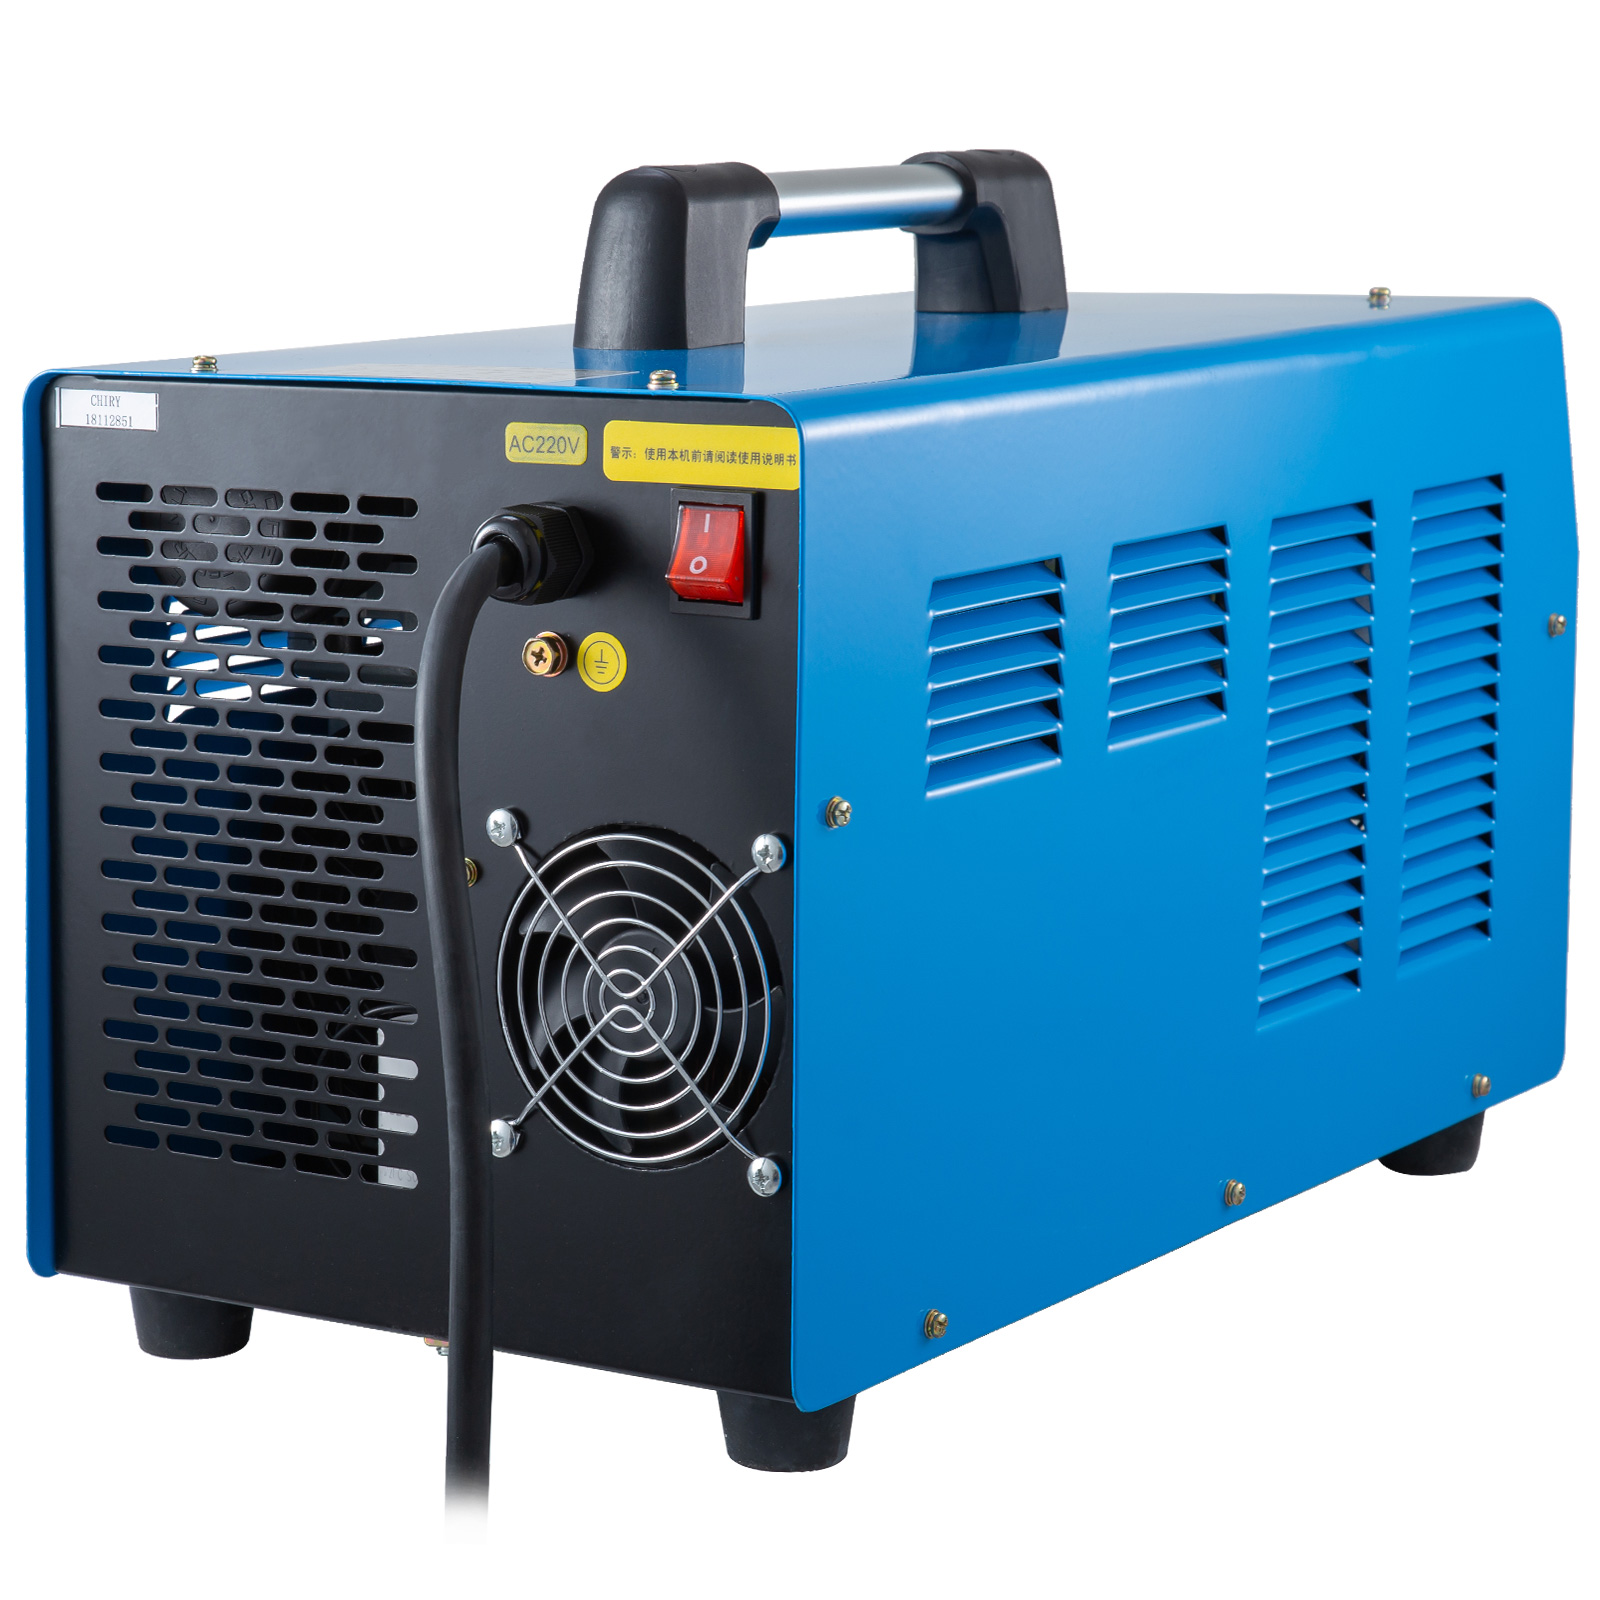 40-85A-Plasma-Cutter-Built-In-Air-Compressor-Inverter-Cutting-Machine-Cut-35mm thumbnail 35